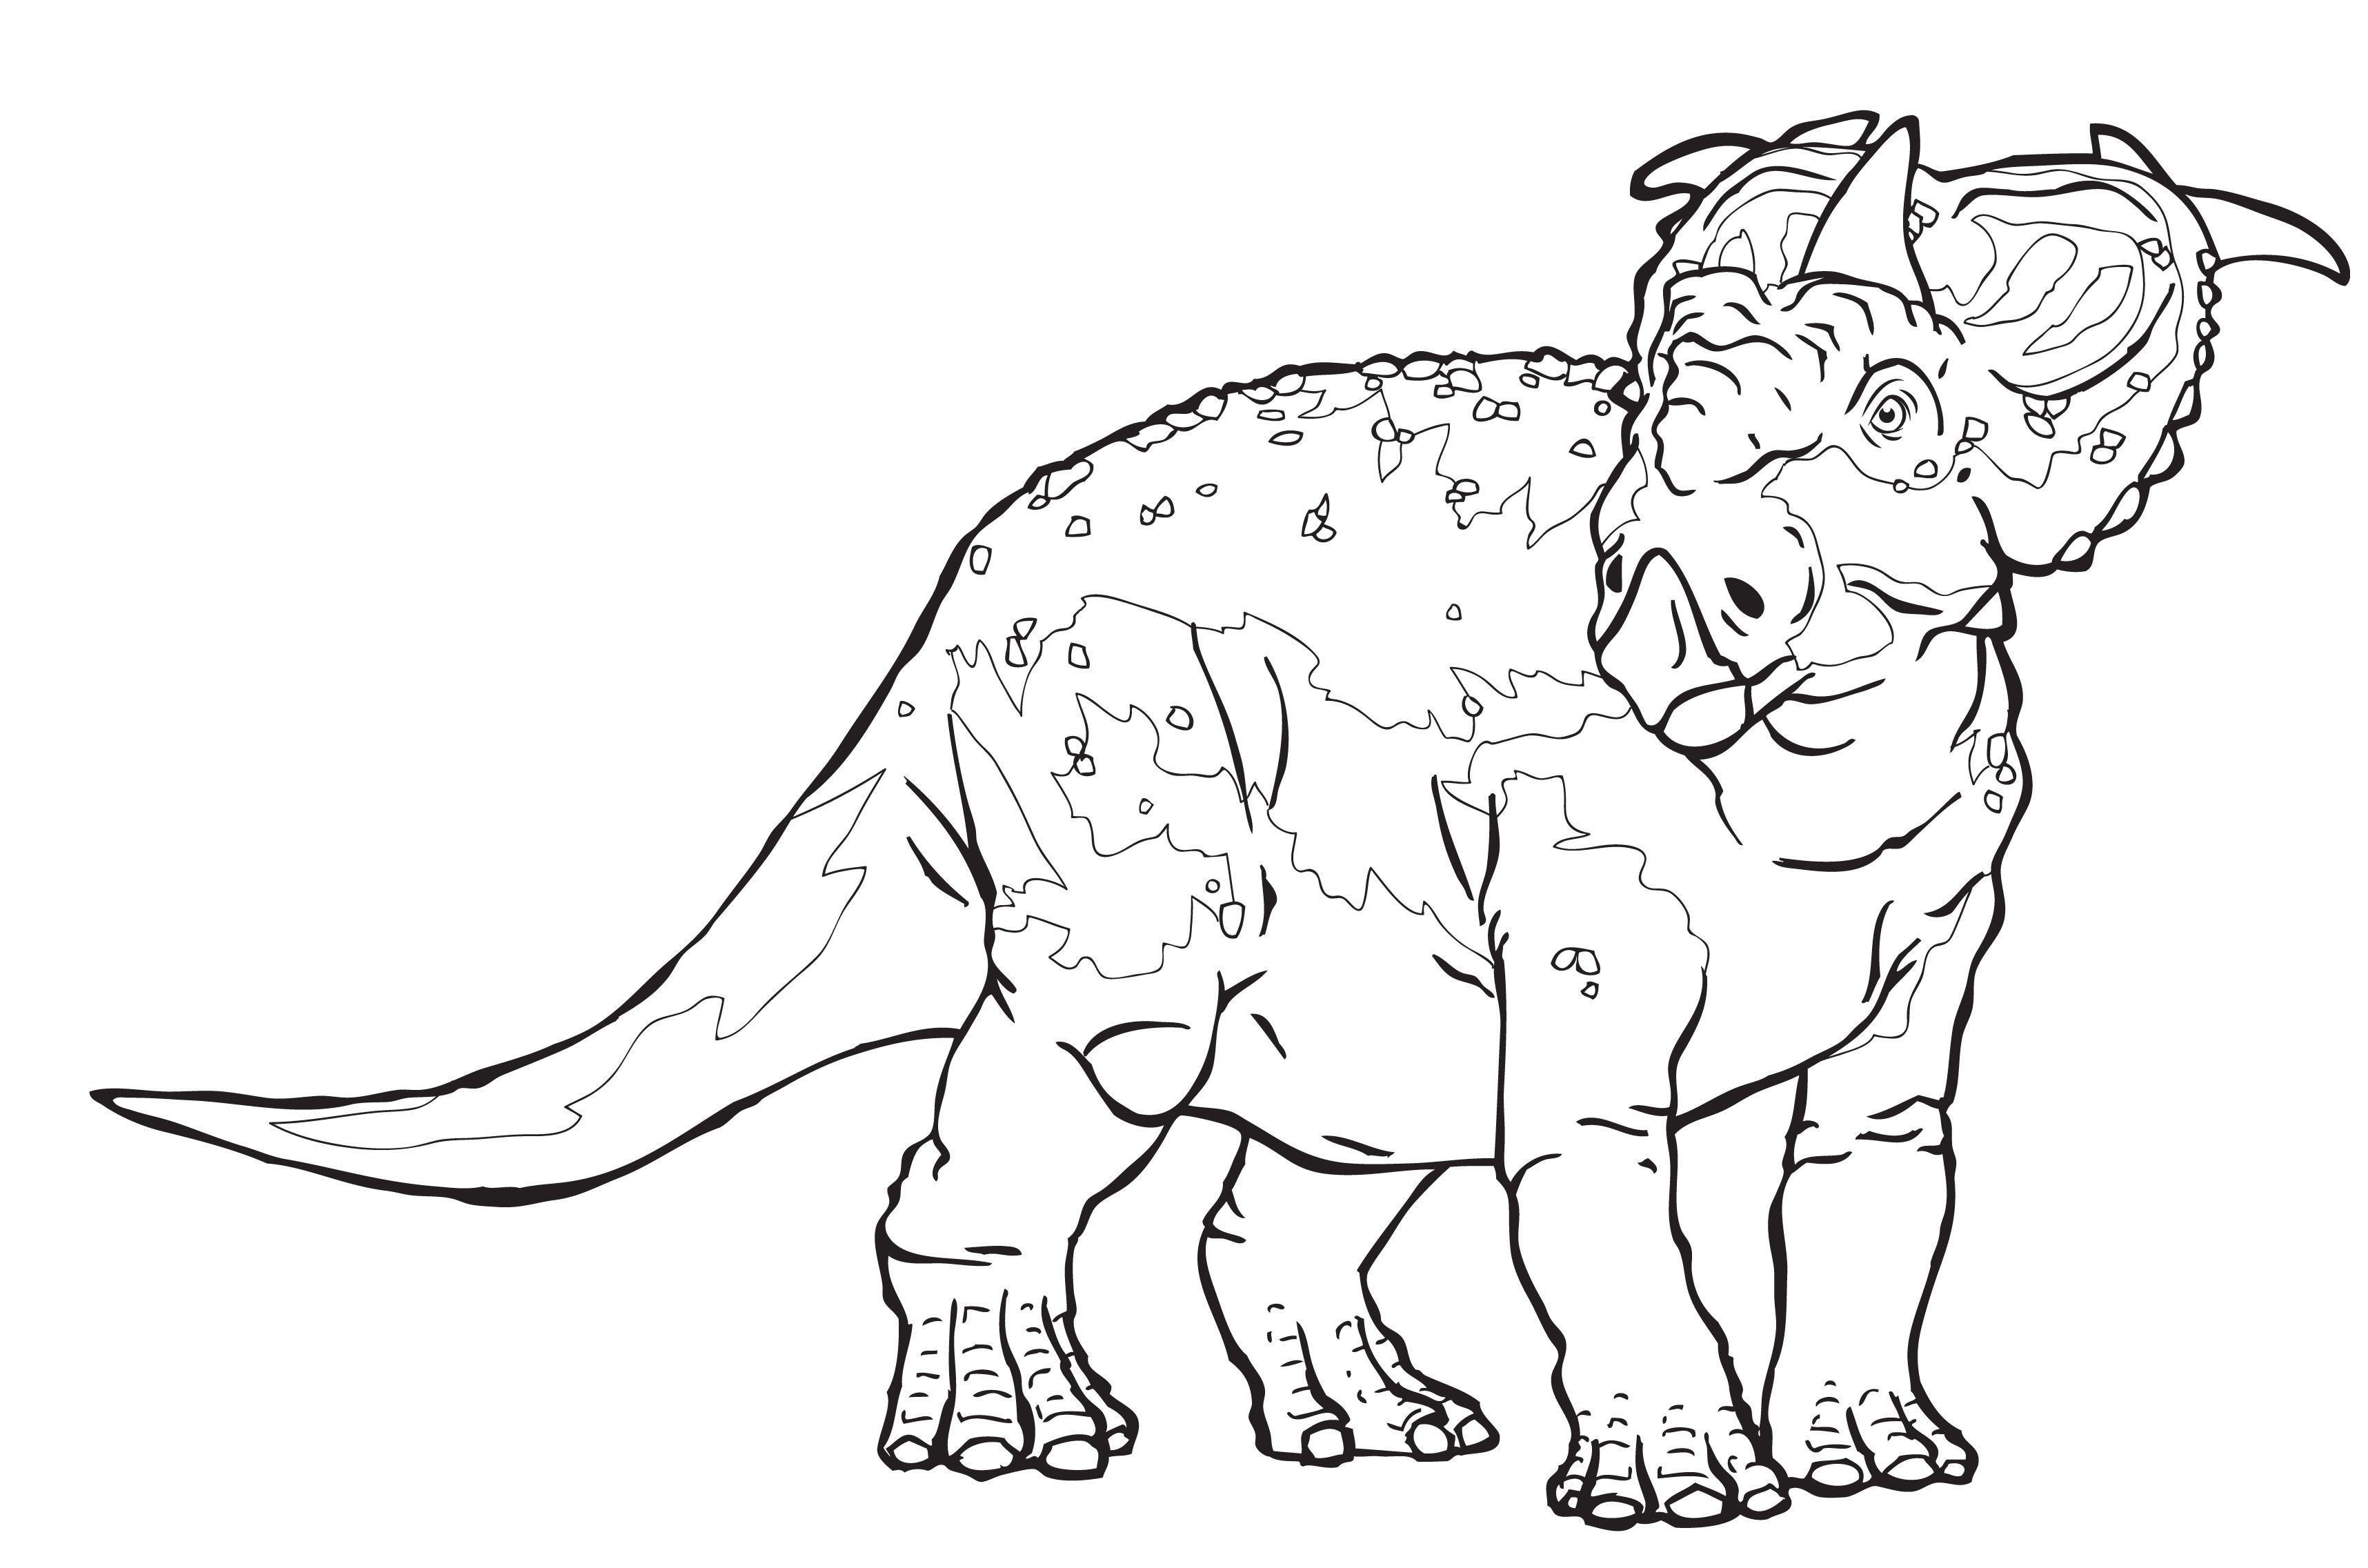 Pachyrhinosaurus Dinosaurs | Coloring Pages | Pinterest